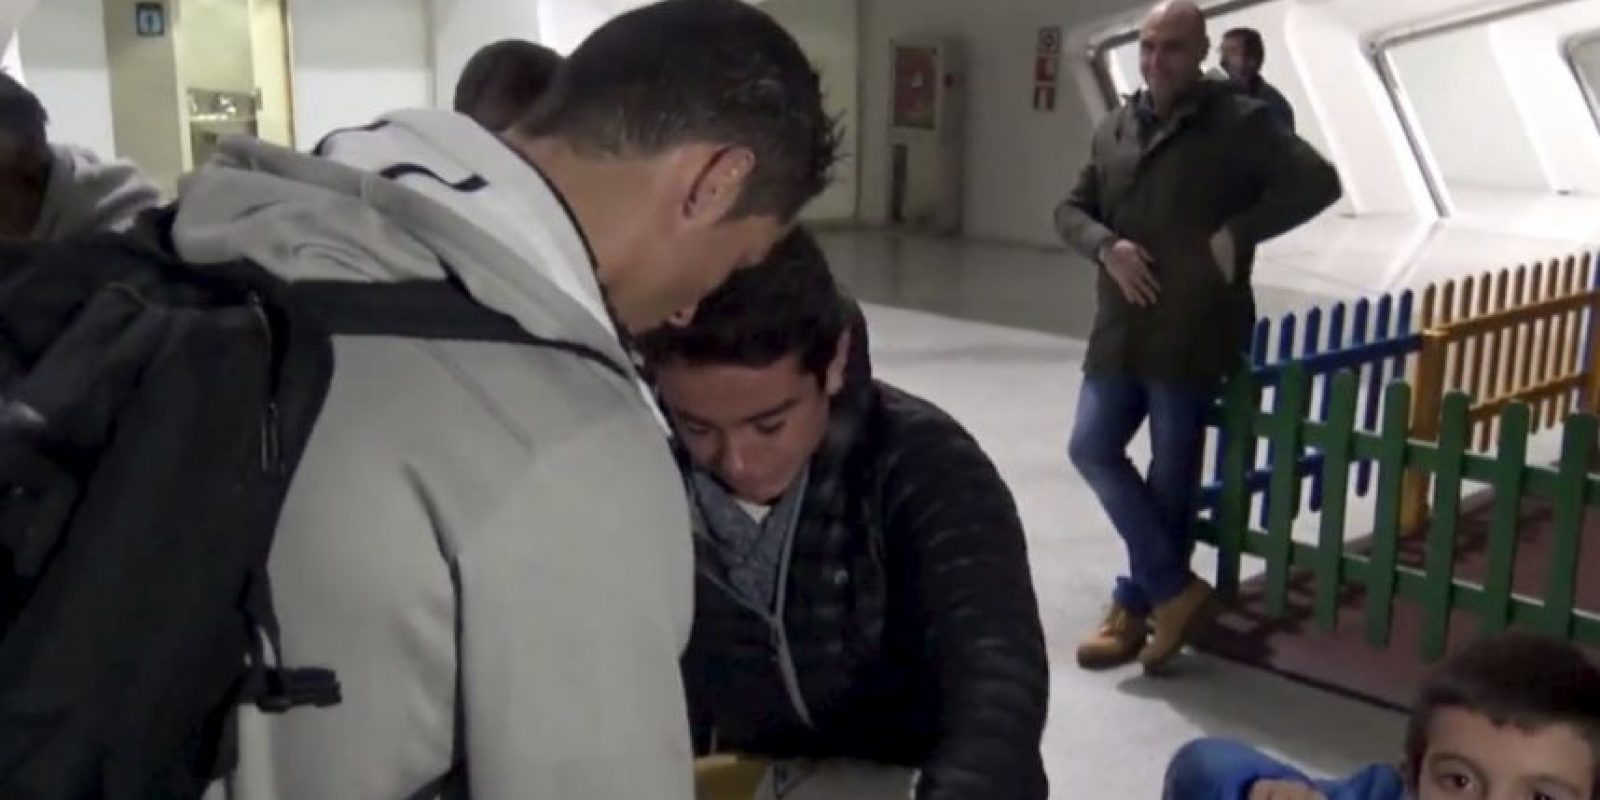 El futbolista portugués se detuvo para firmarle la camiseta. Foto:twitter.com/realmadrid